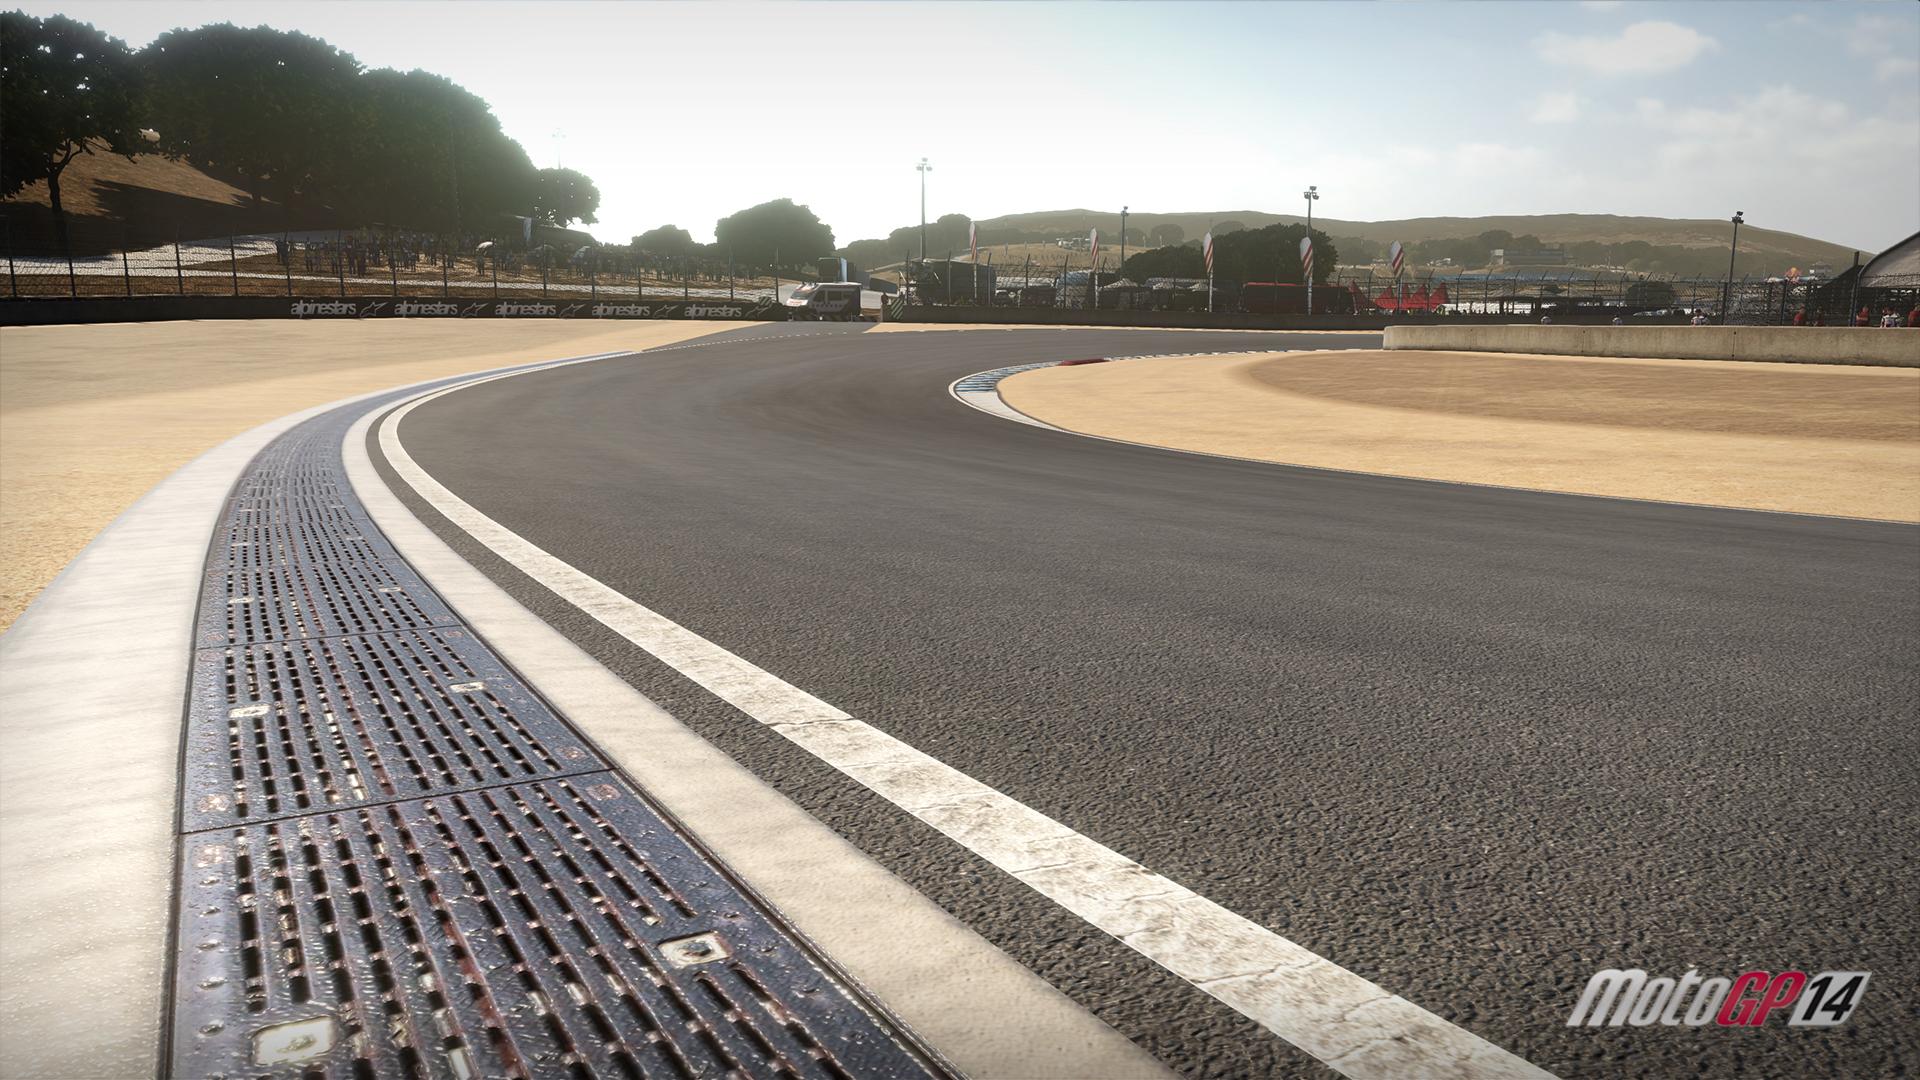 MotoGP14 Season Pass screenshot